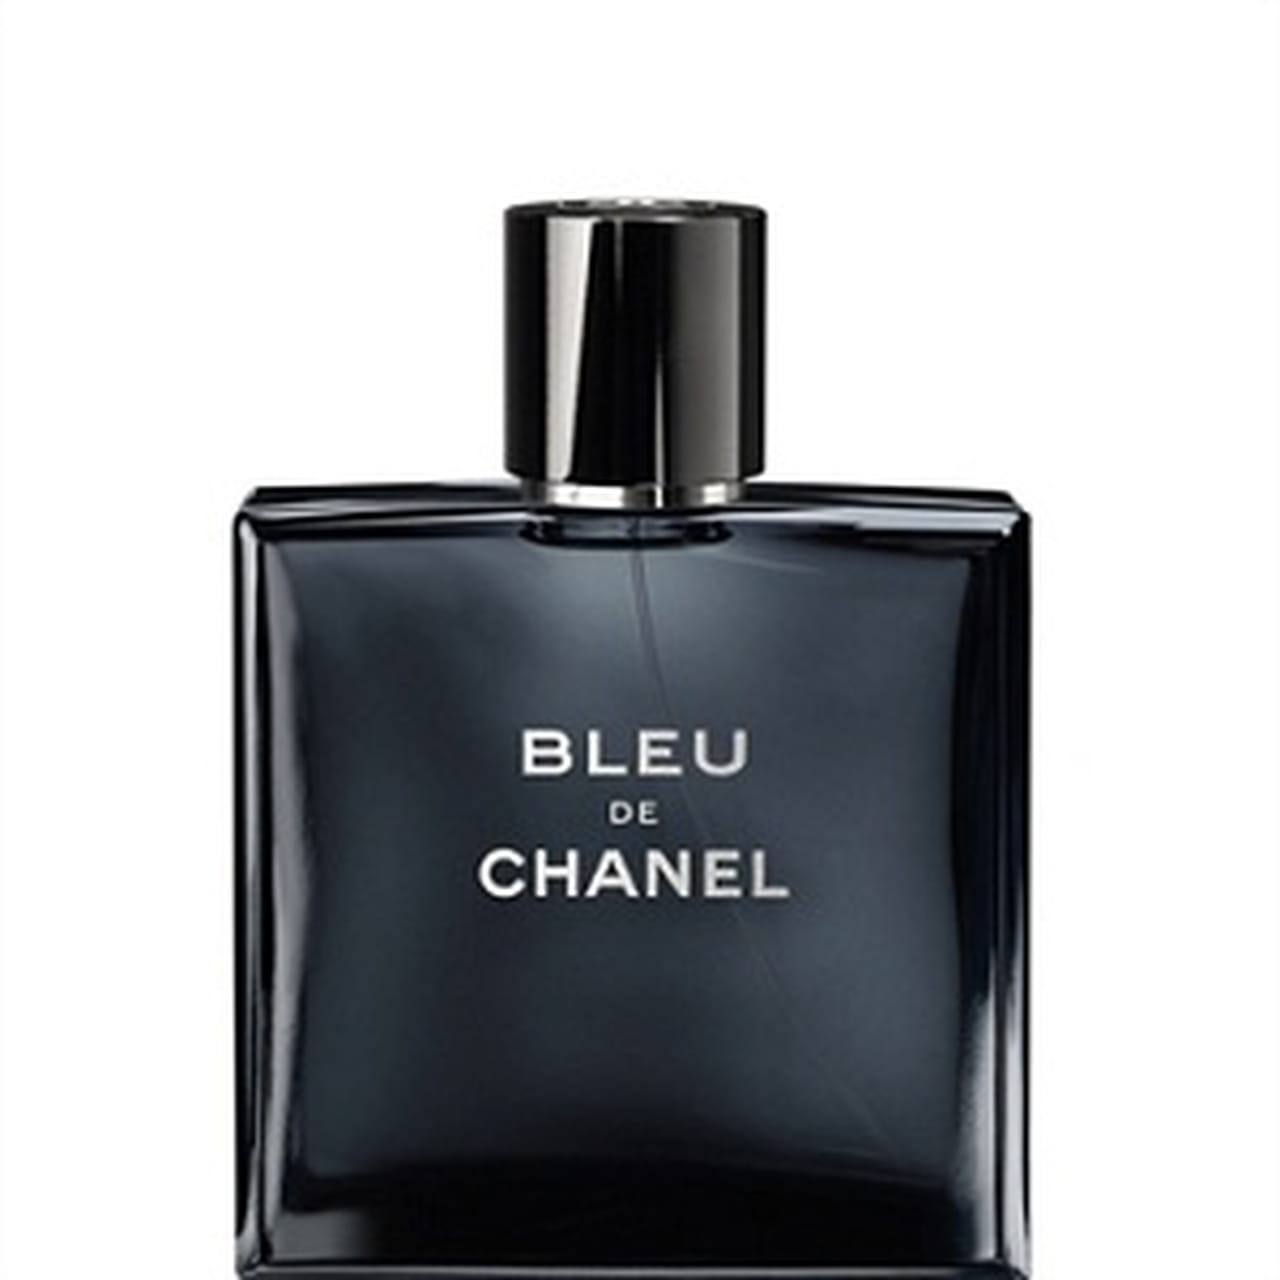 2c364ec45 مجموعة أنيقة من أفضل عطور Chanel